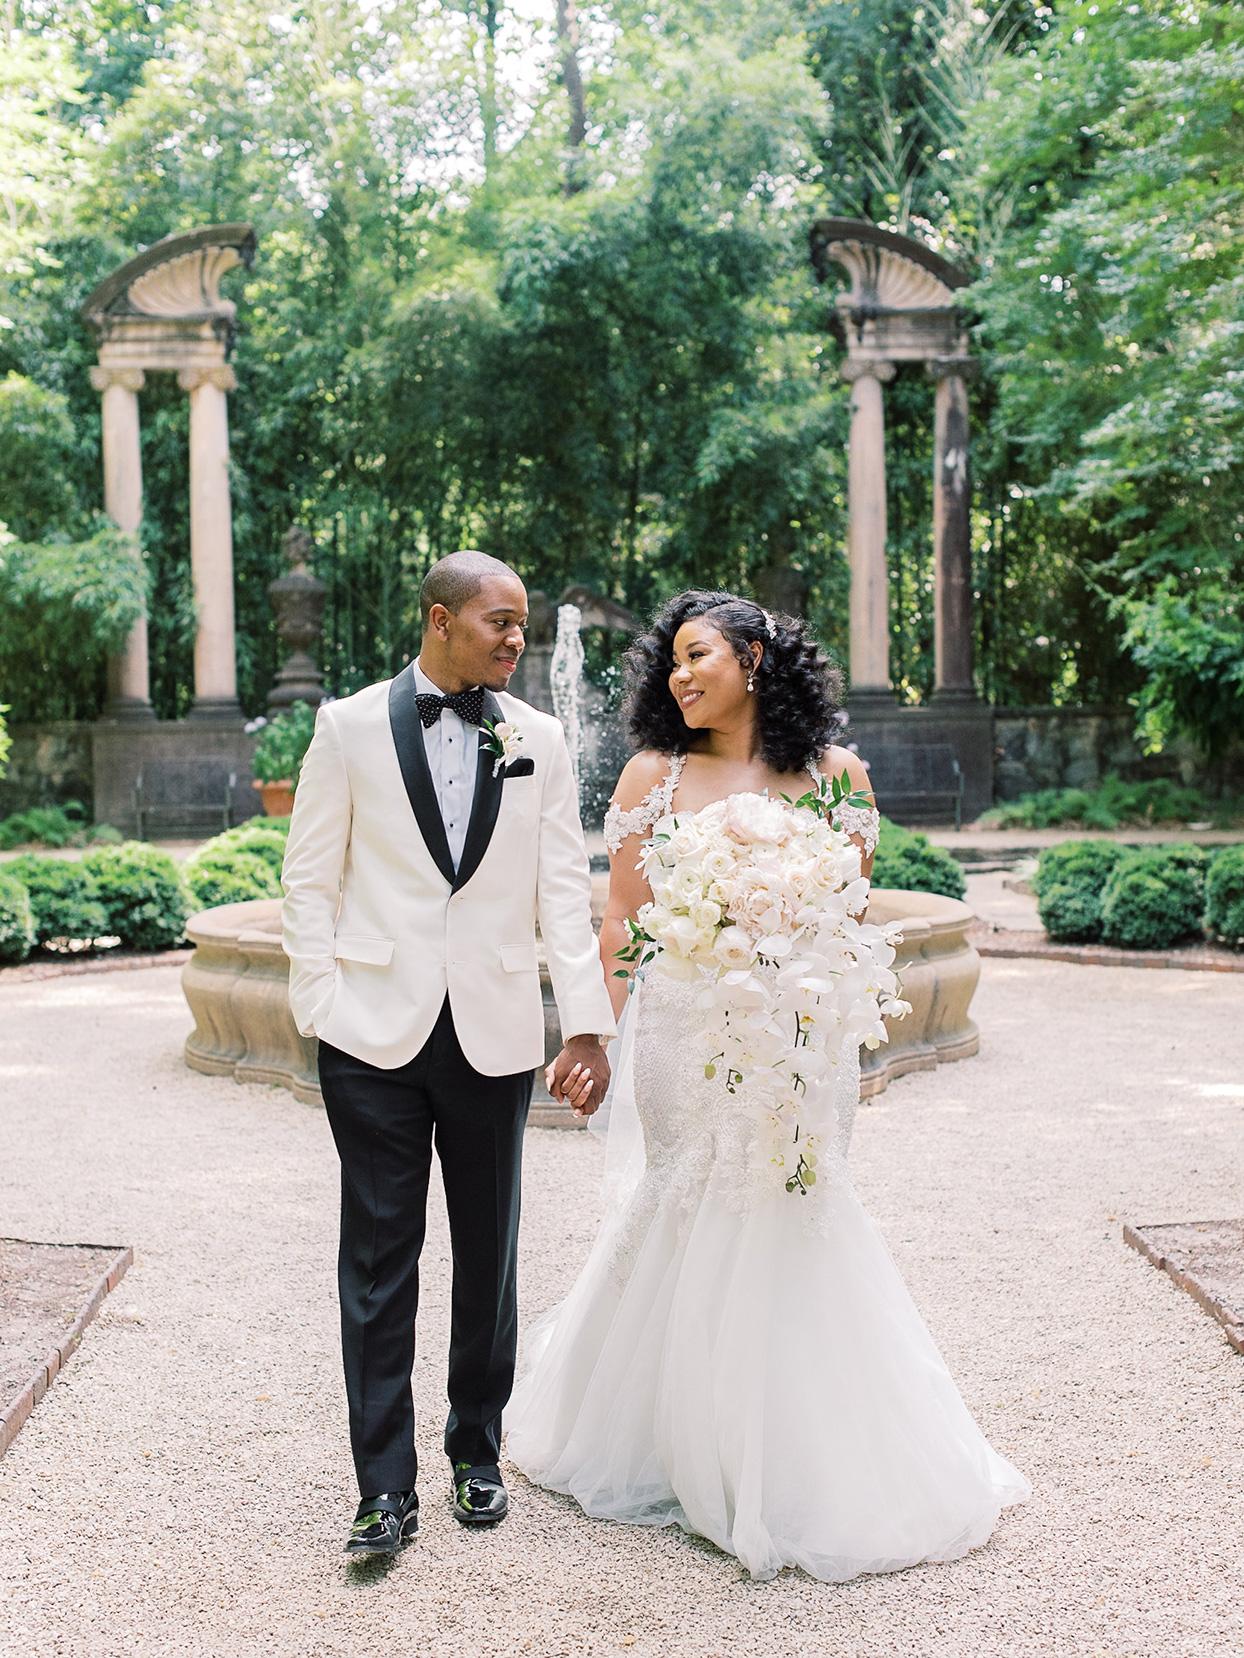 This Wedding in Atlanta—a Summertime Garden Soirée—Exemplified Southern Elegance